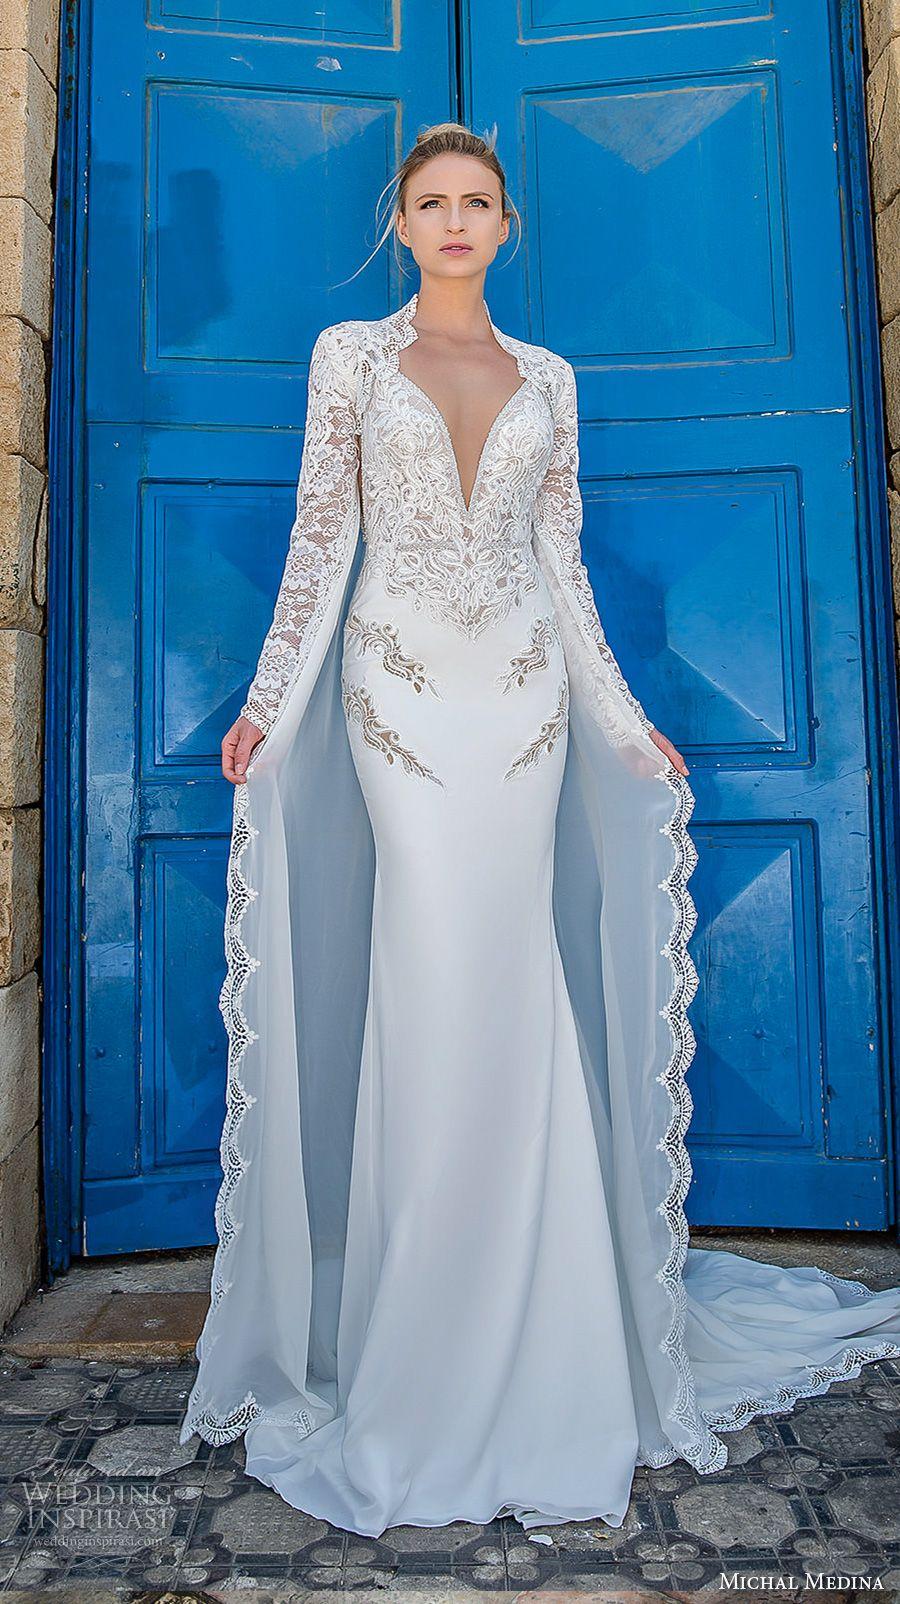 Michal medina wedding dresses u ucgoldud couture bridal